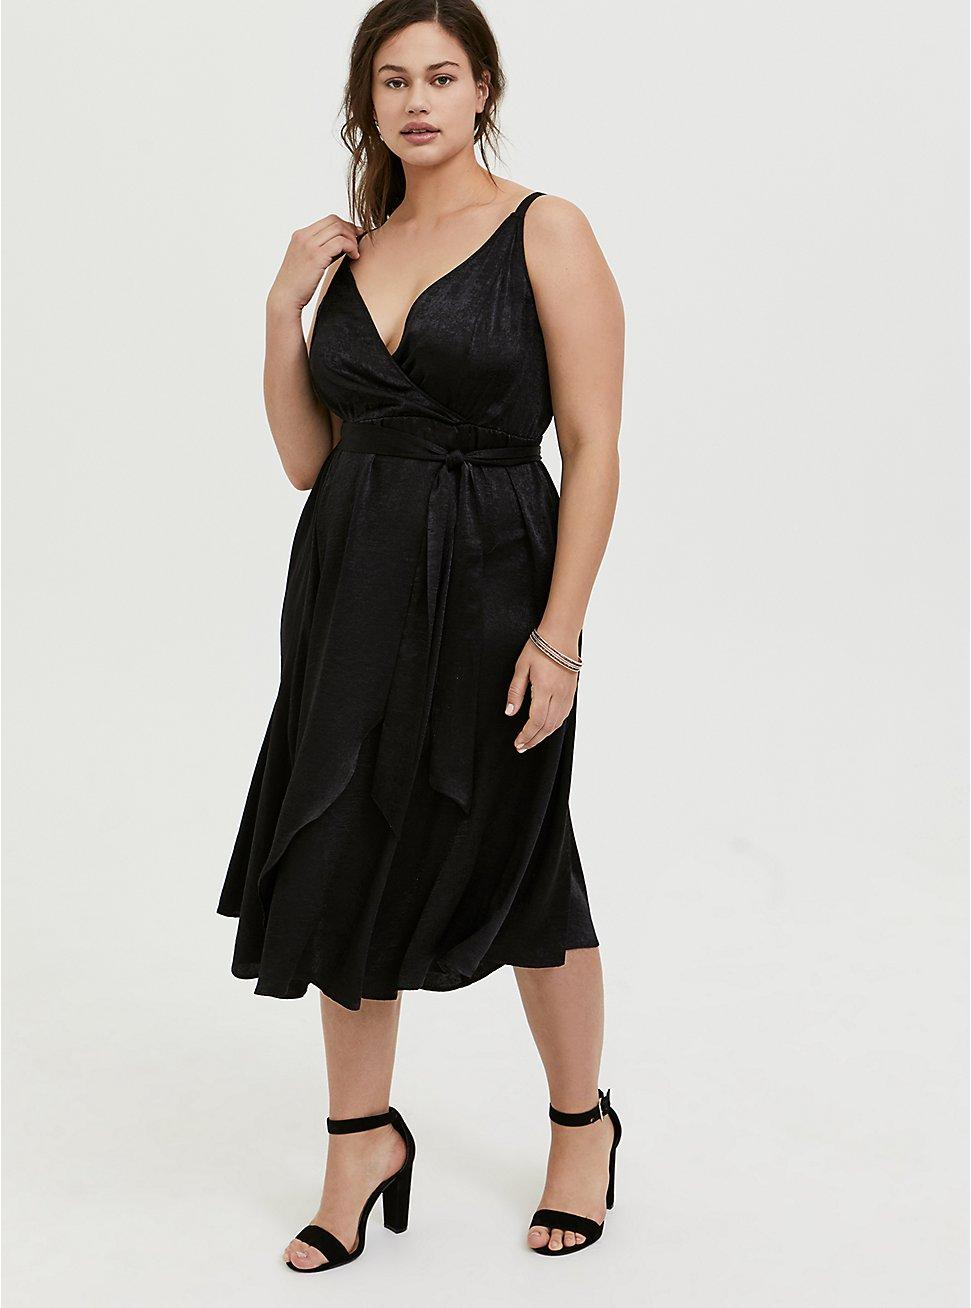 Plus Size Black Textured Charmeuse Midi Wrap Dress, , hi-res